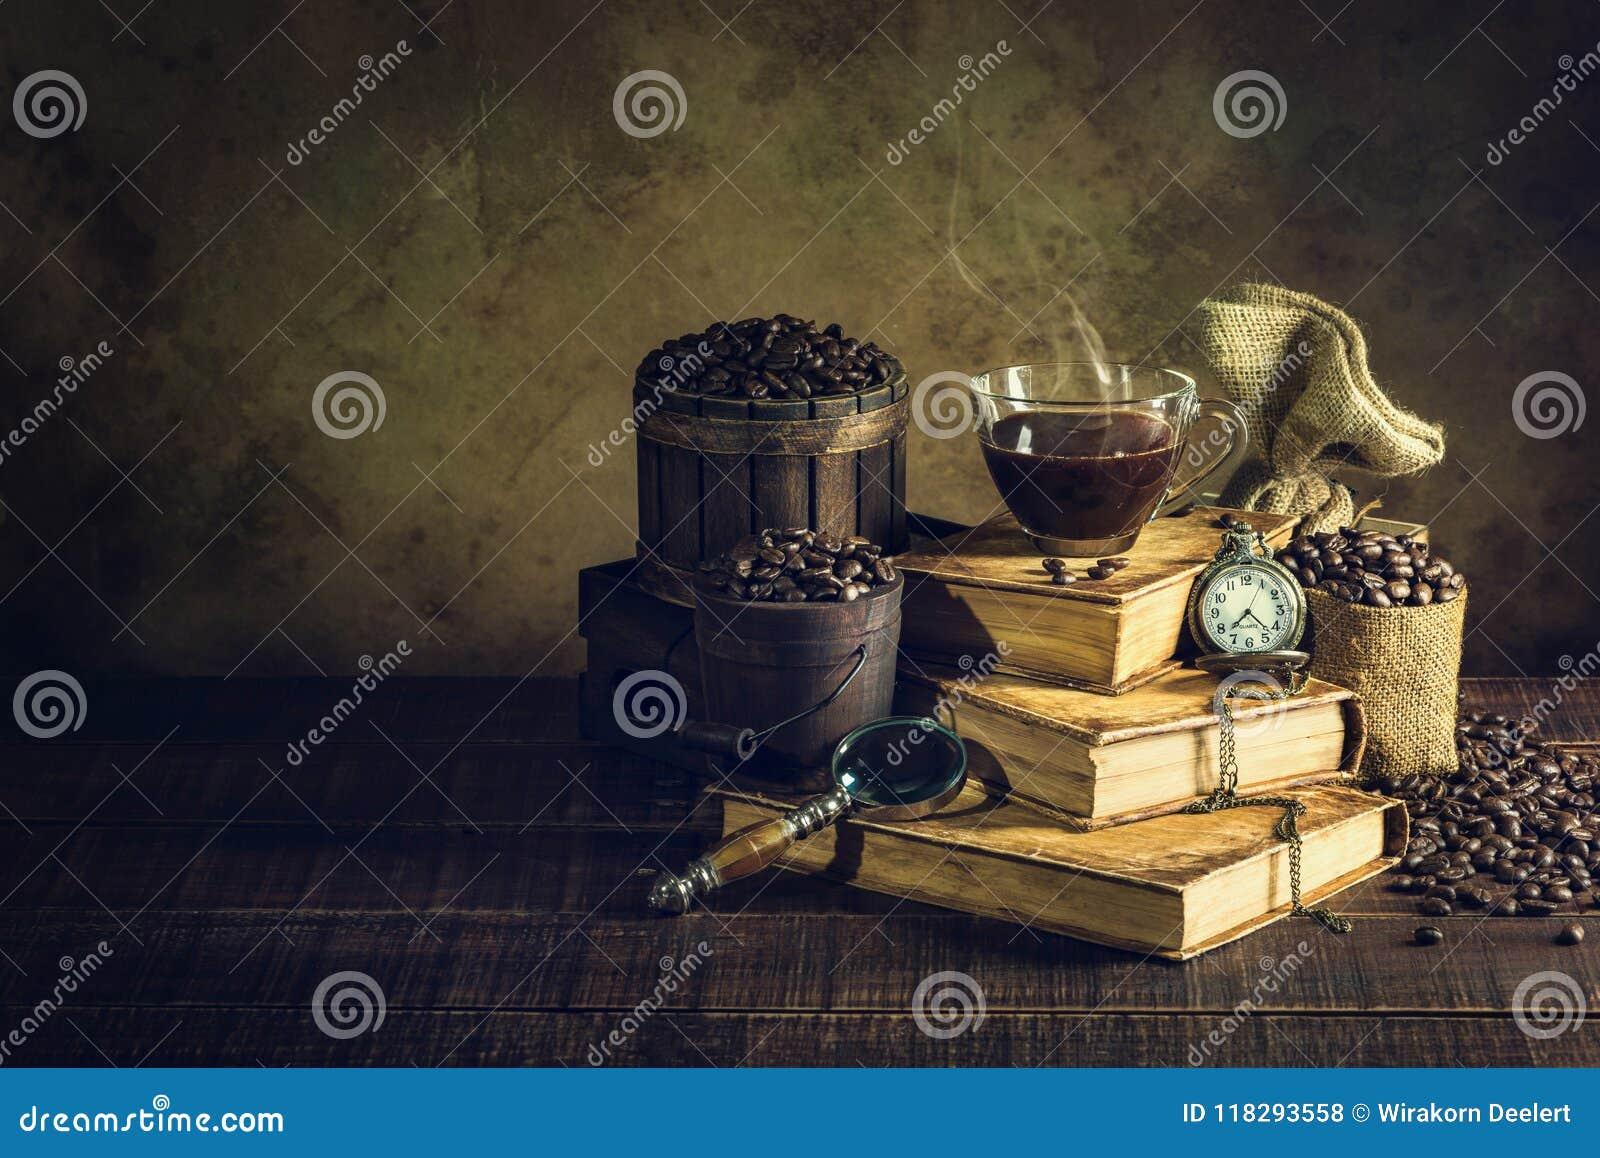 Koffie in kopglas op oude boeken en klokwijnoogst op oud hout